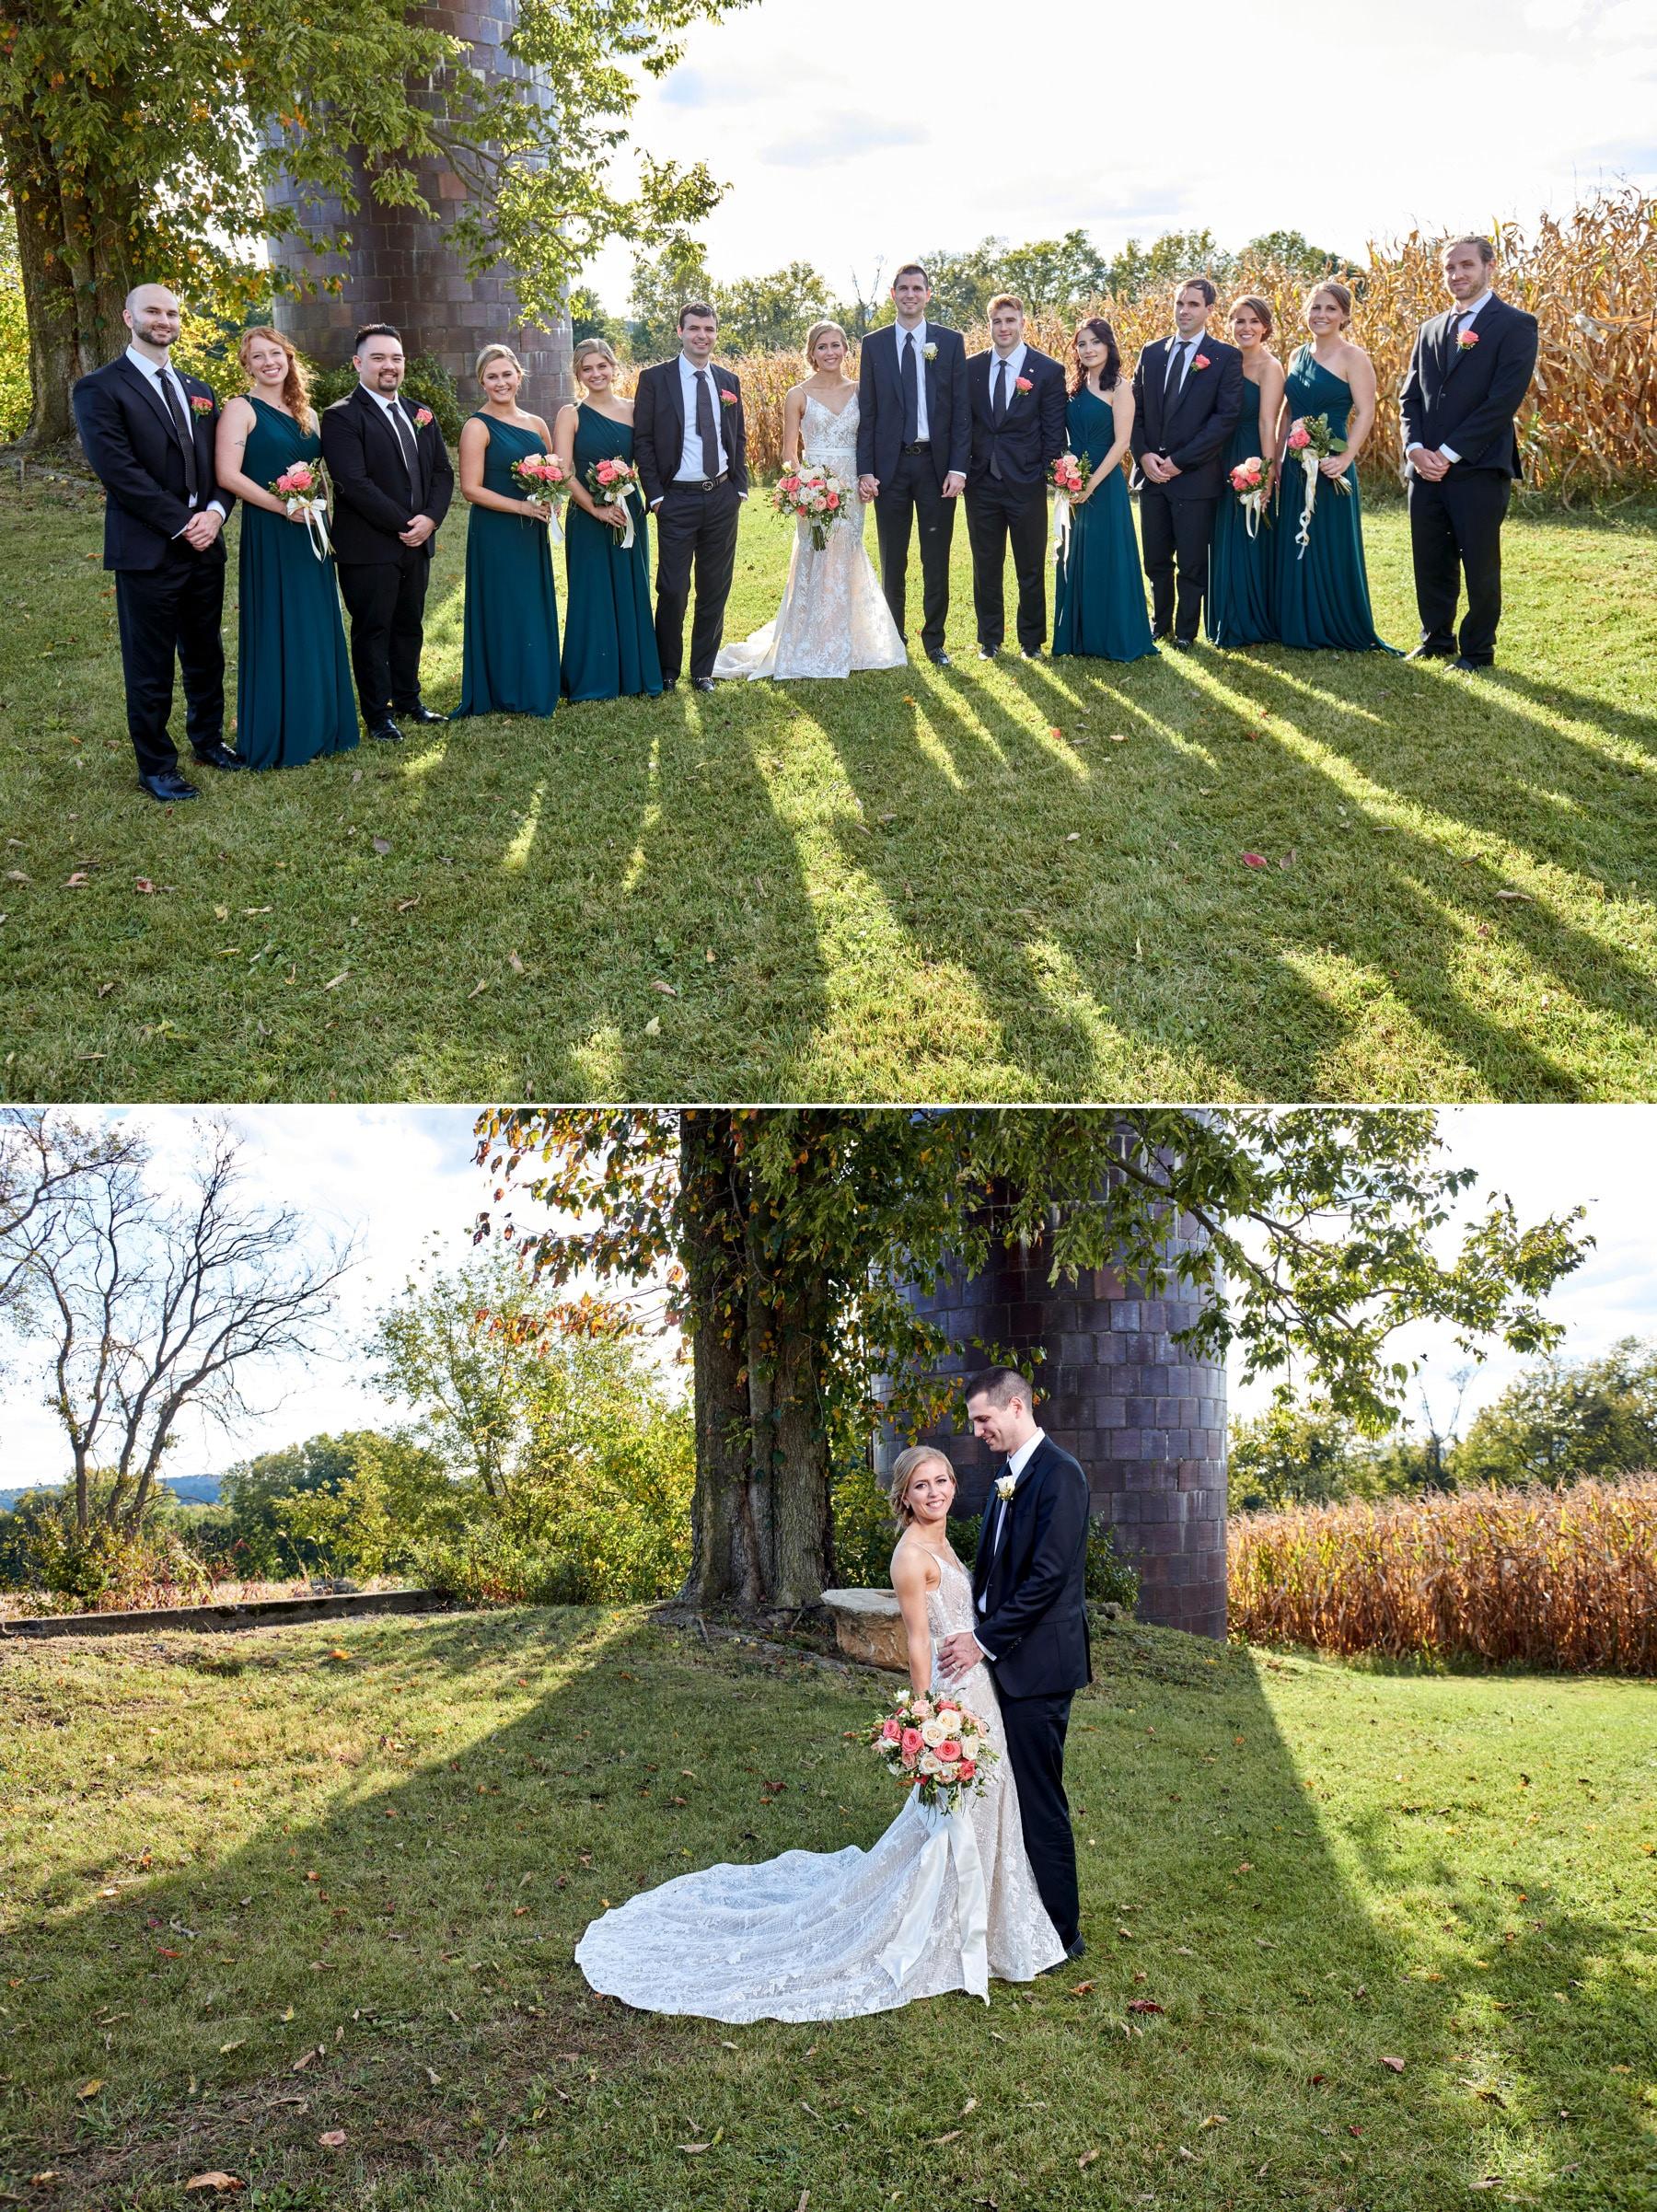 Villa Milagro Vineyards bridal party photo